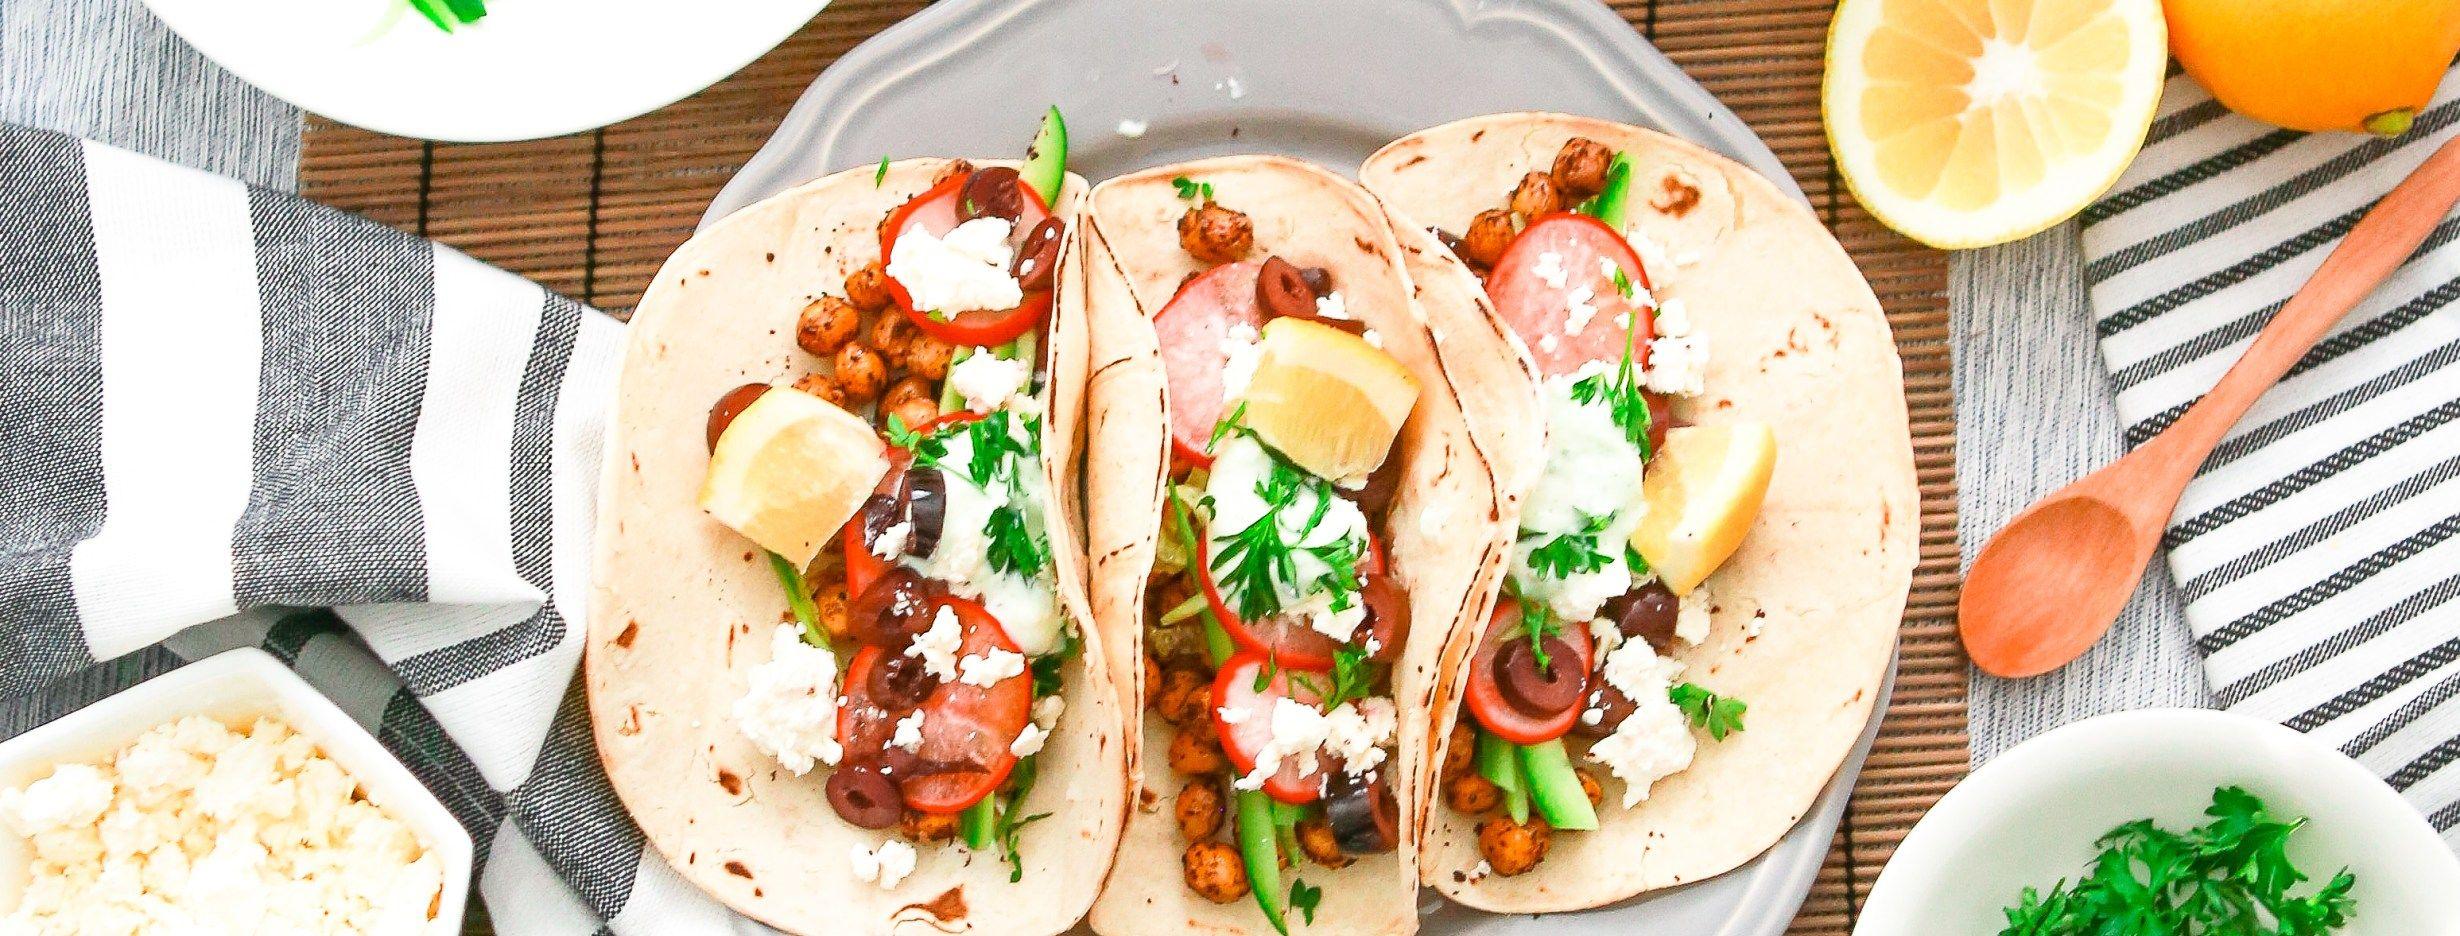 Veggie Chickpea Tacos In